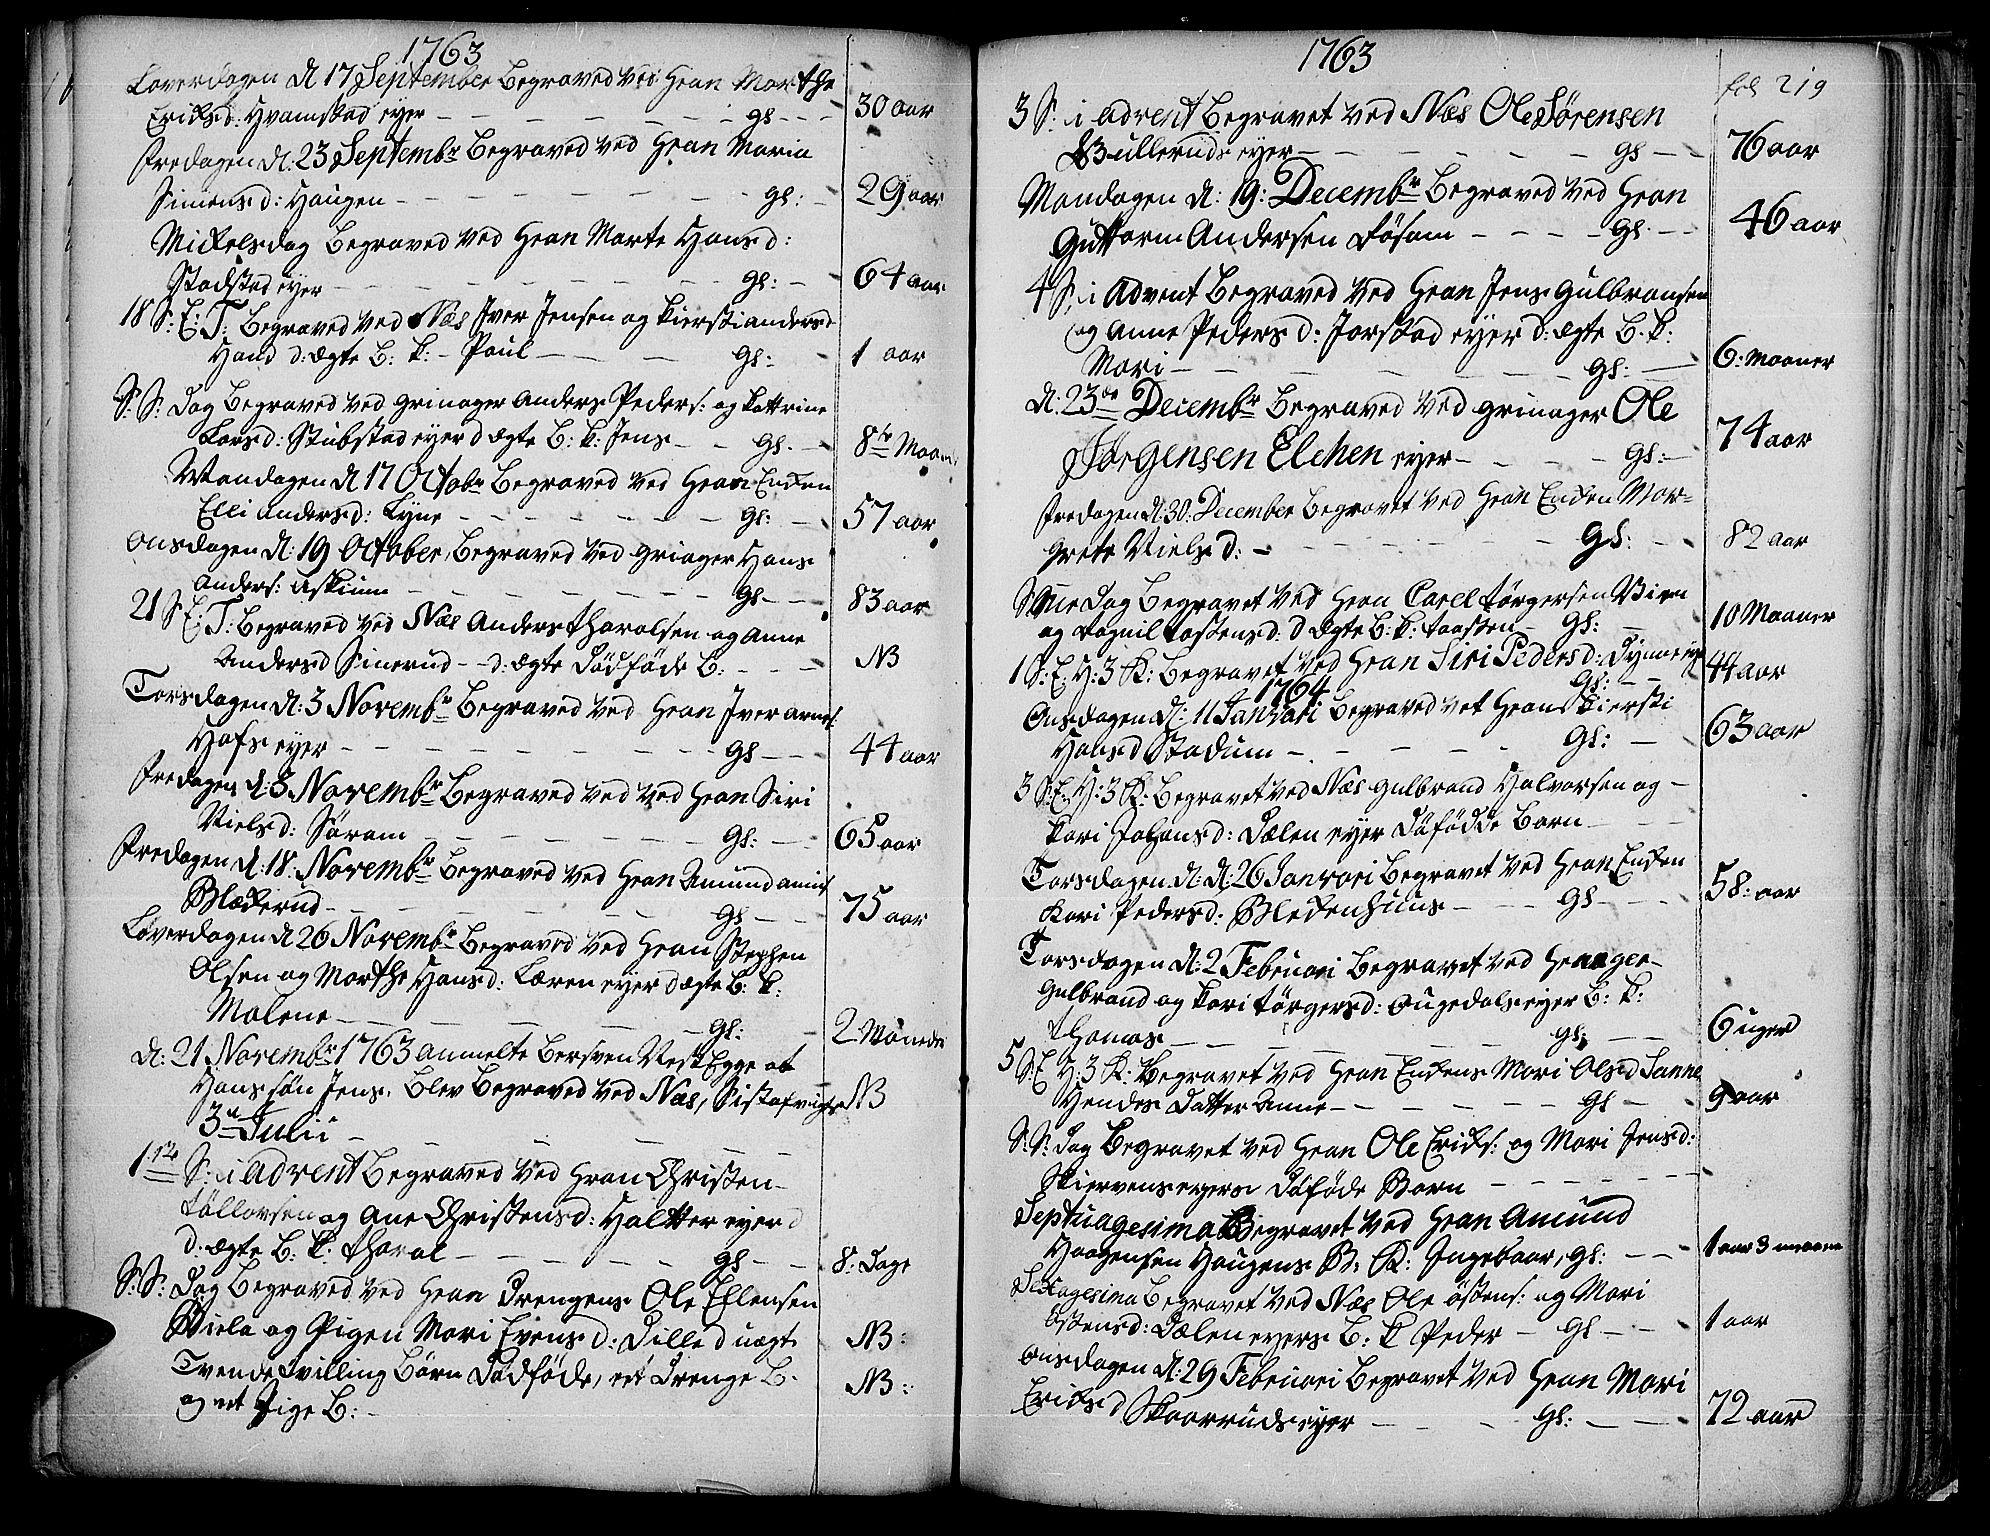 SAH, Gran prestekontor, Ministerialbok nr. 4, 1759-1775, s. 219